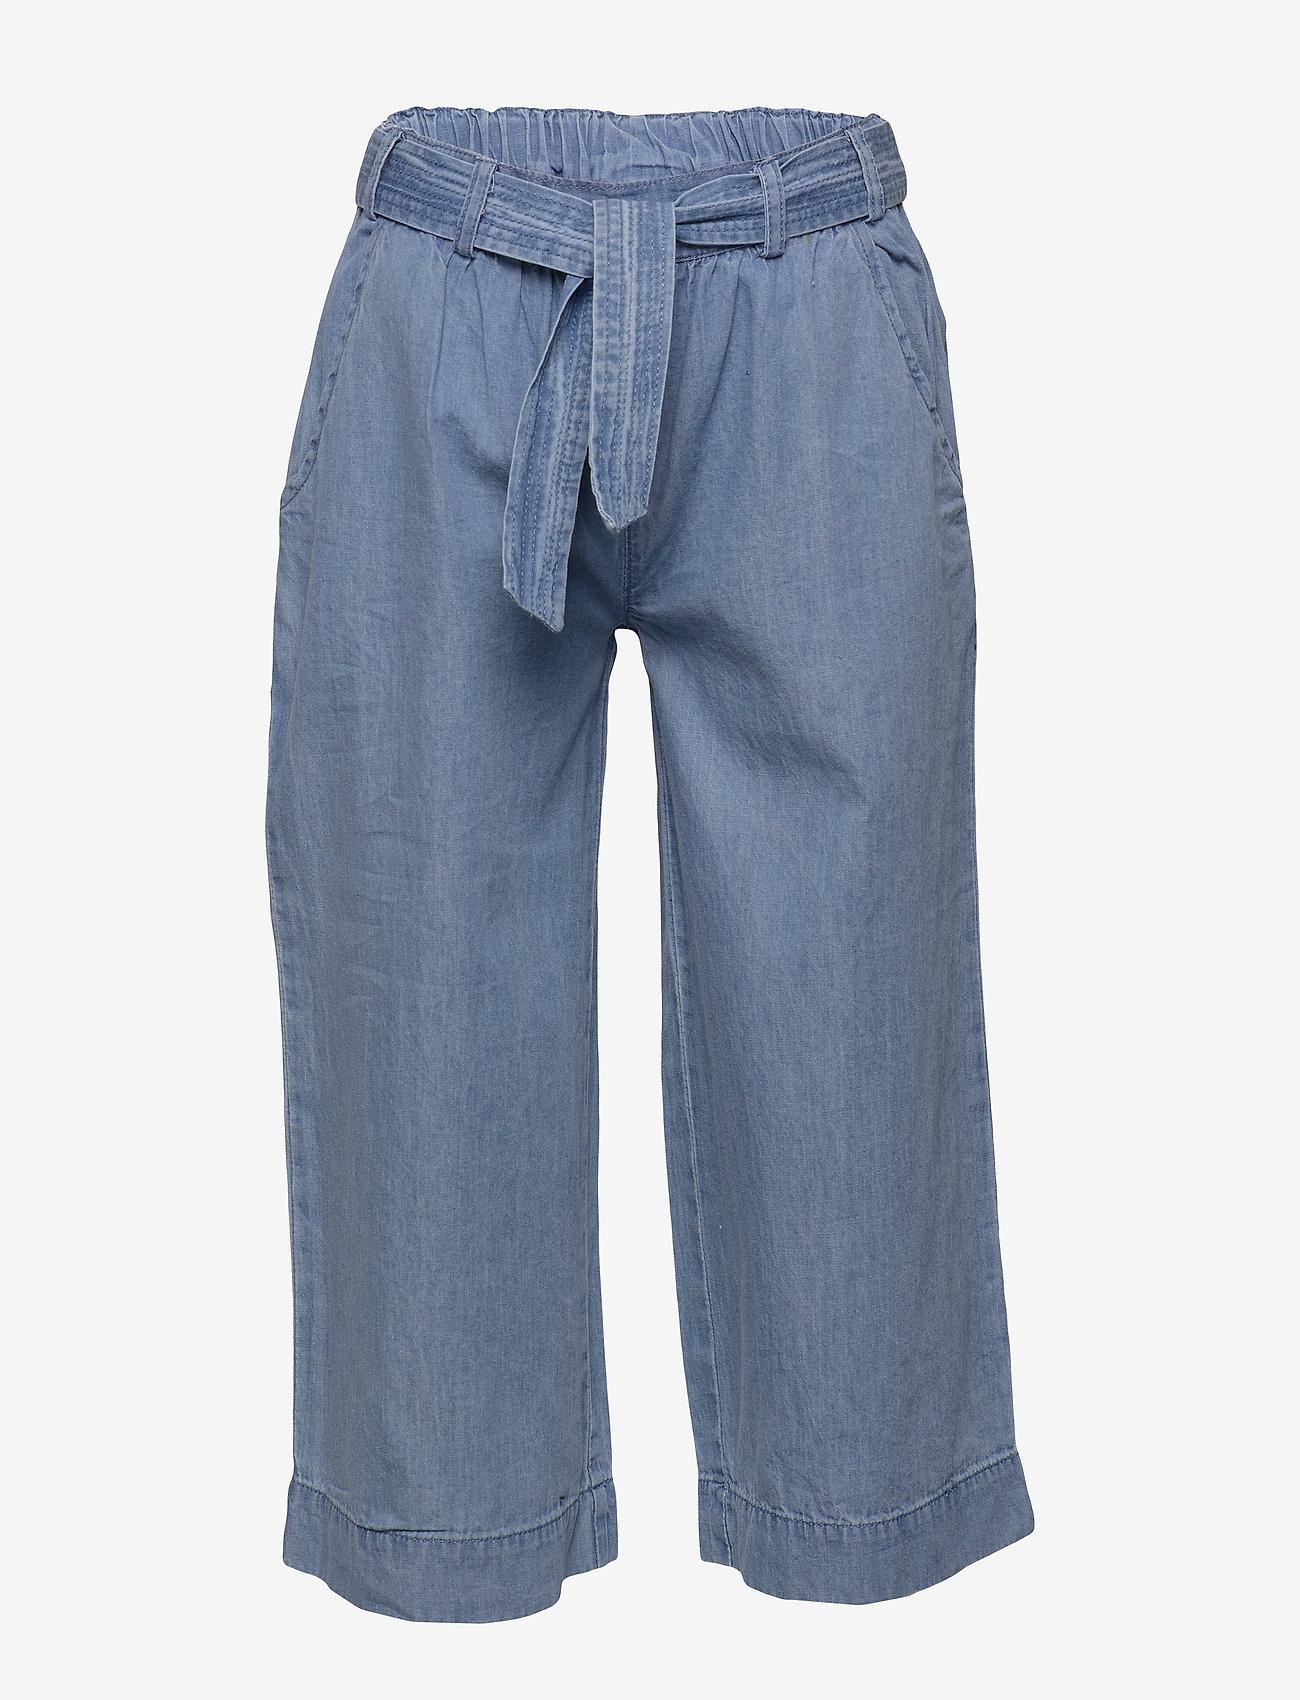 Noa Noa Miniature - Trousers - bukser - delft - 1